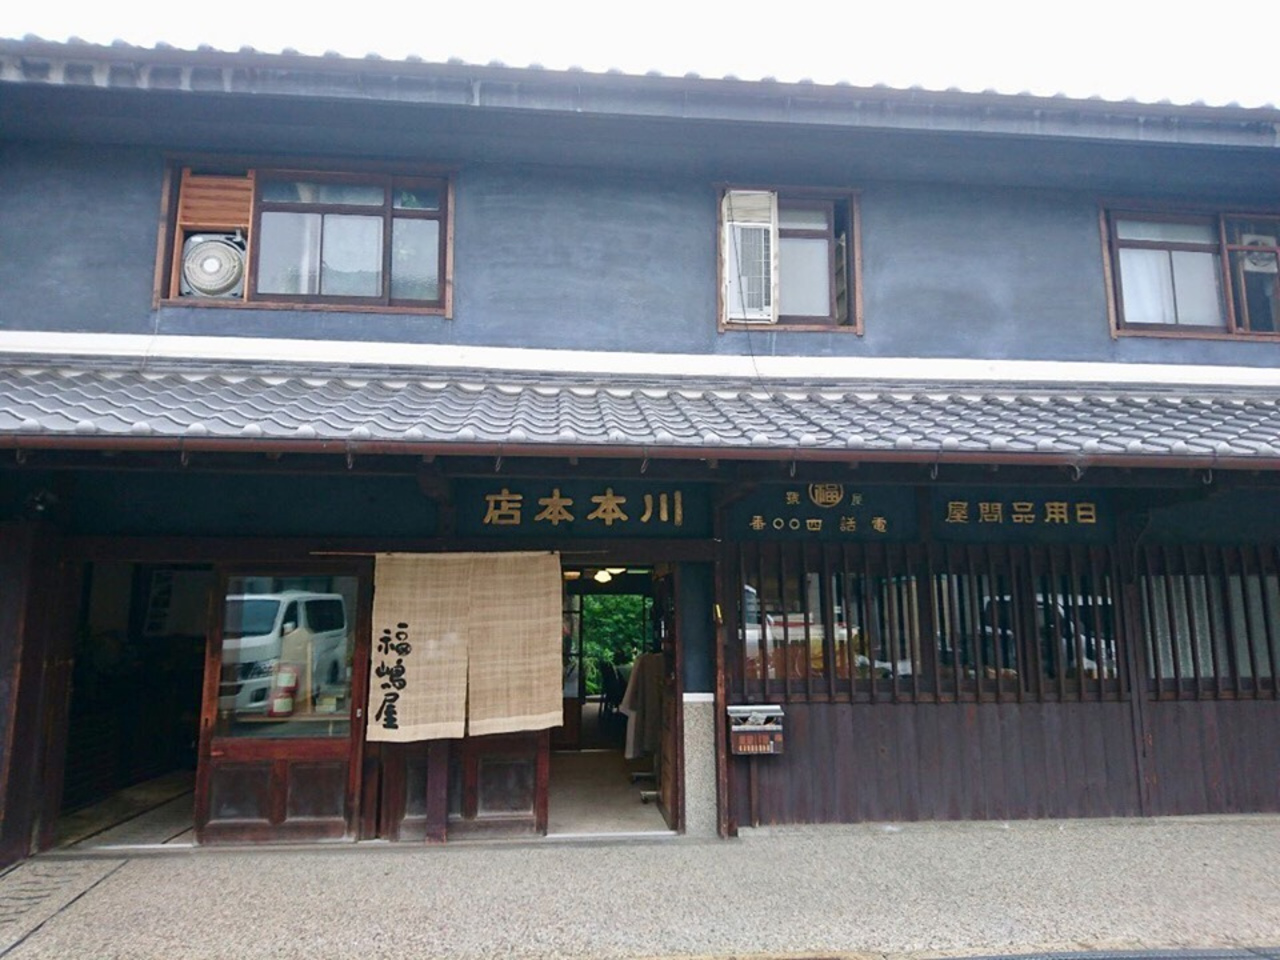 登録有形文化財の町屋cafe。。大阪府茨木市上泉町の発酵カフェ『福嶋屋』